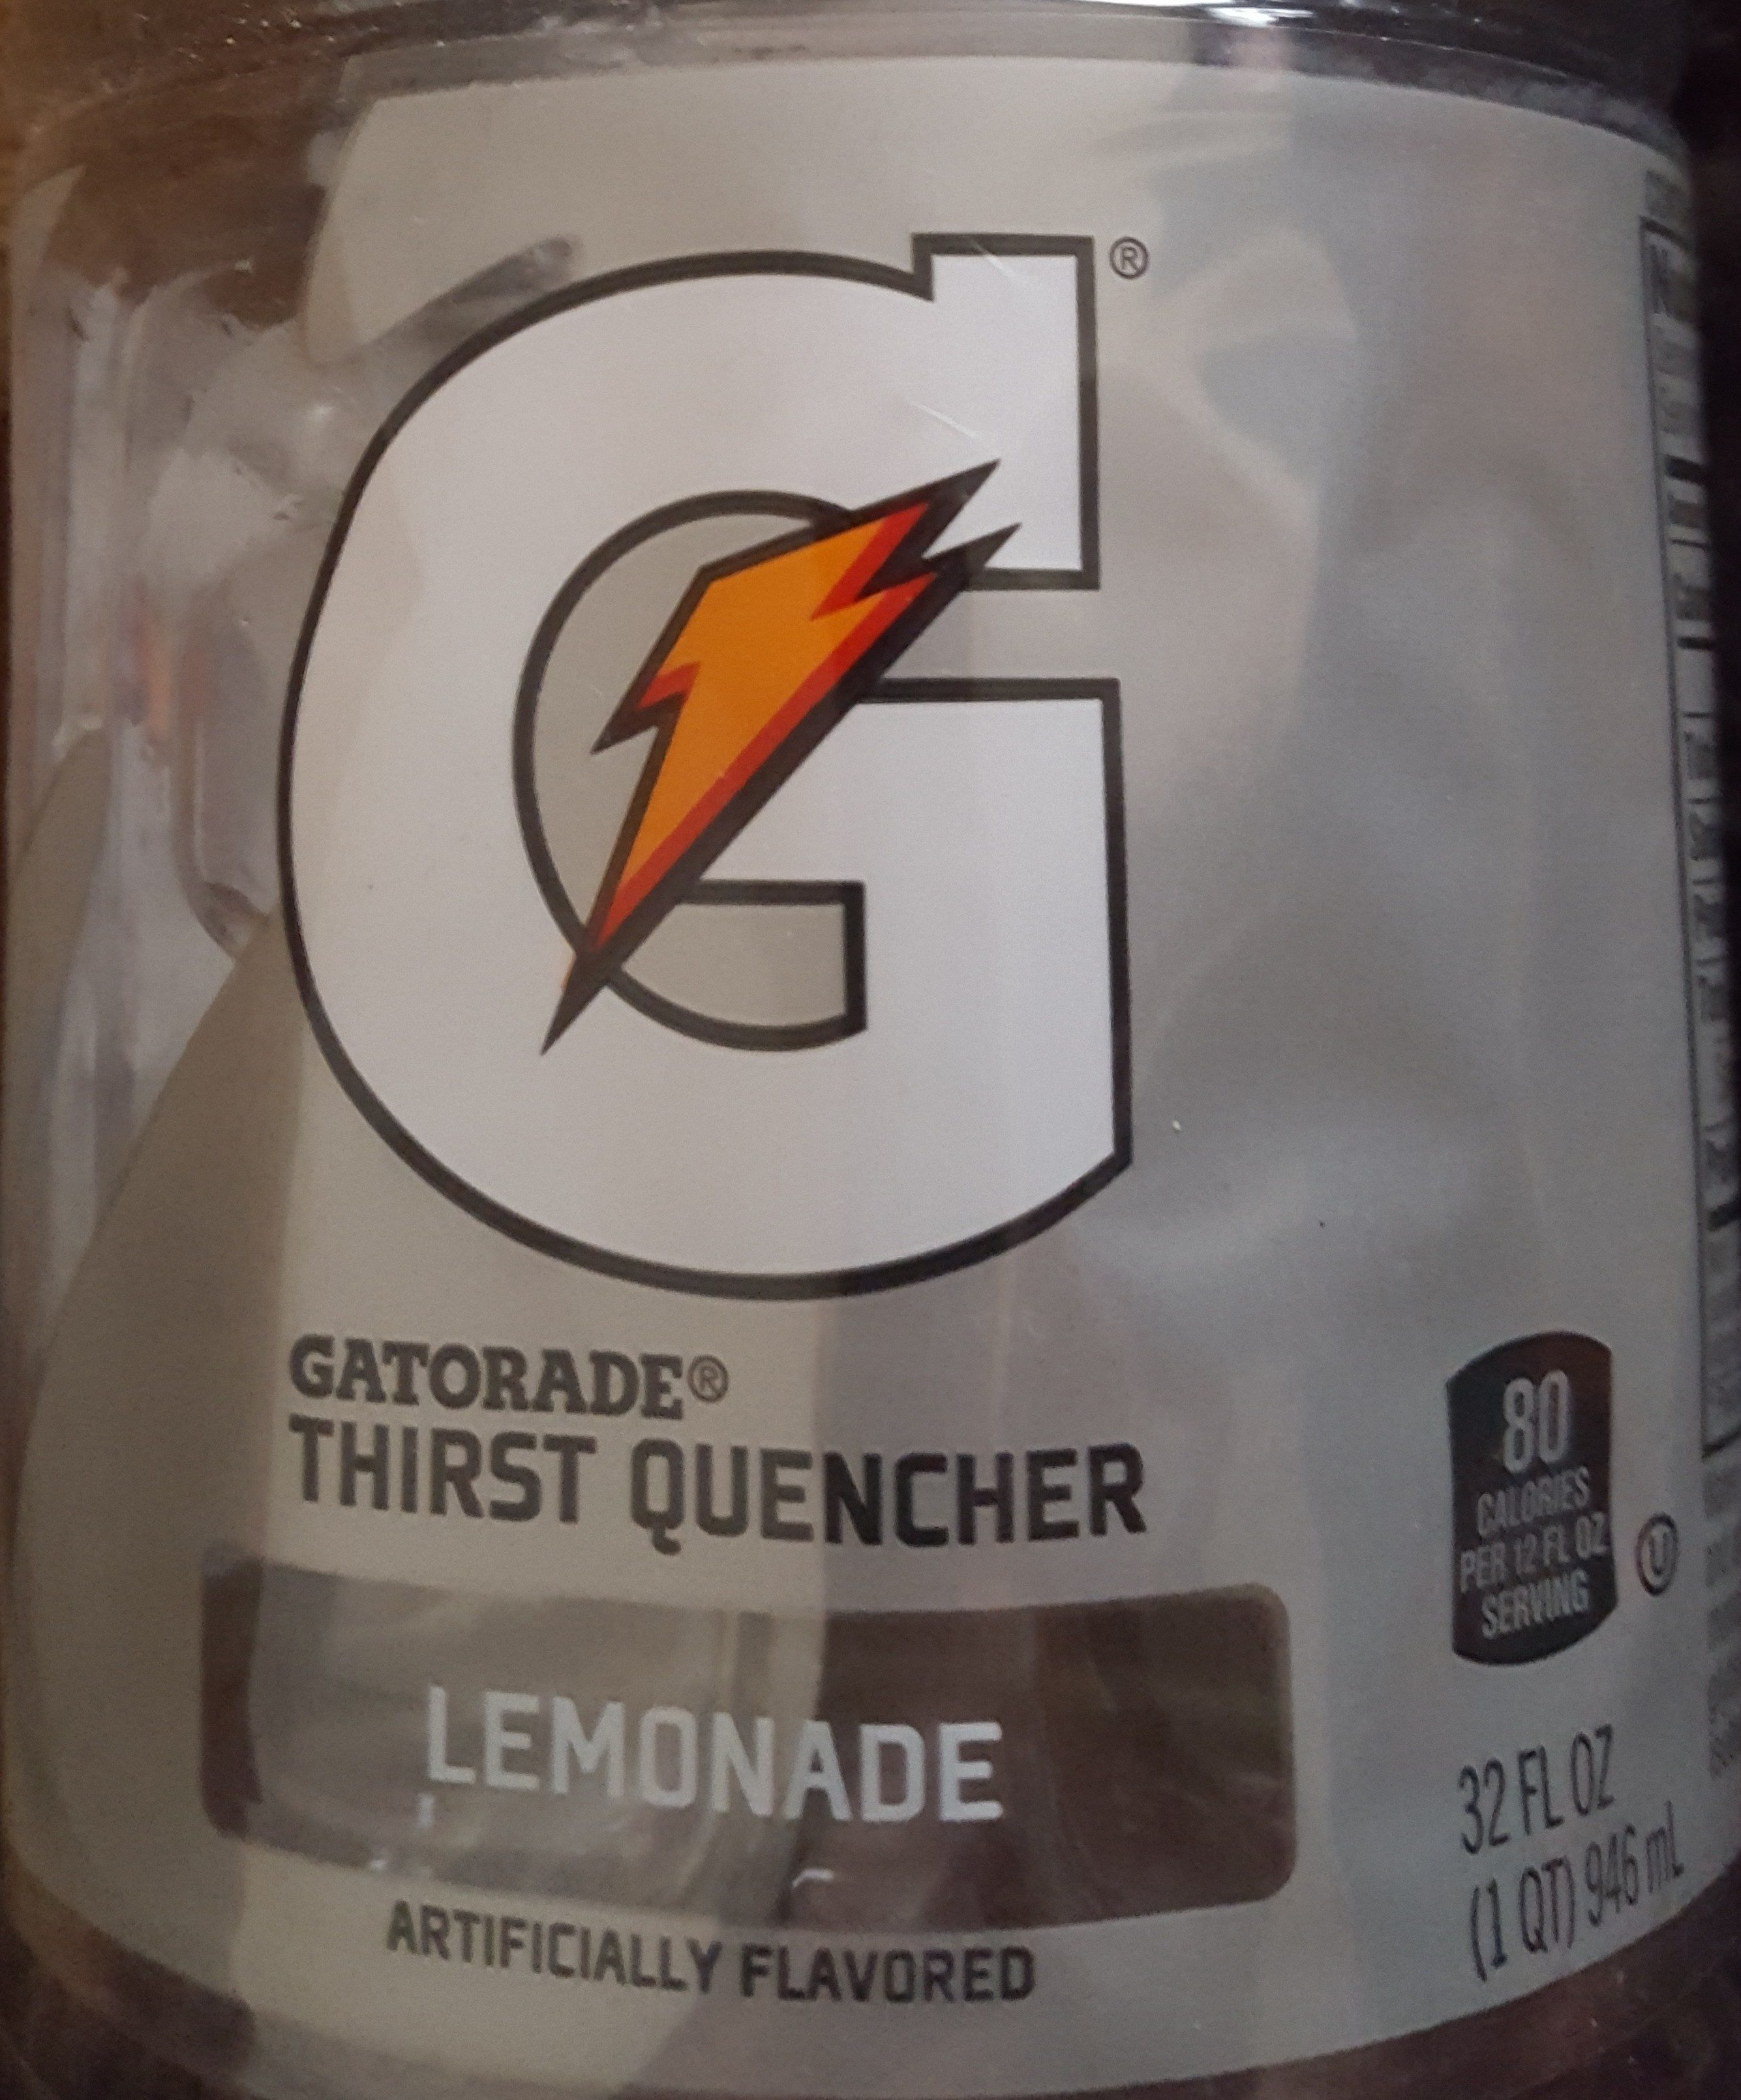 Lemonade thirst quencher, lemonade - Product - en